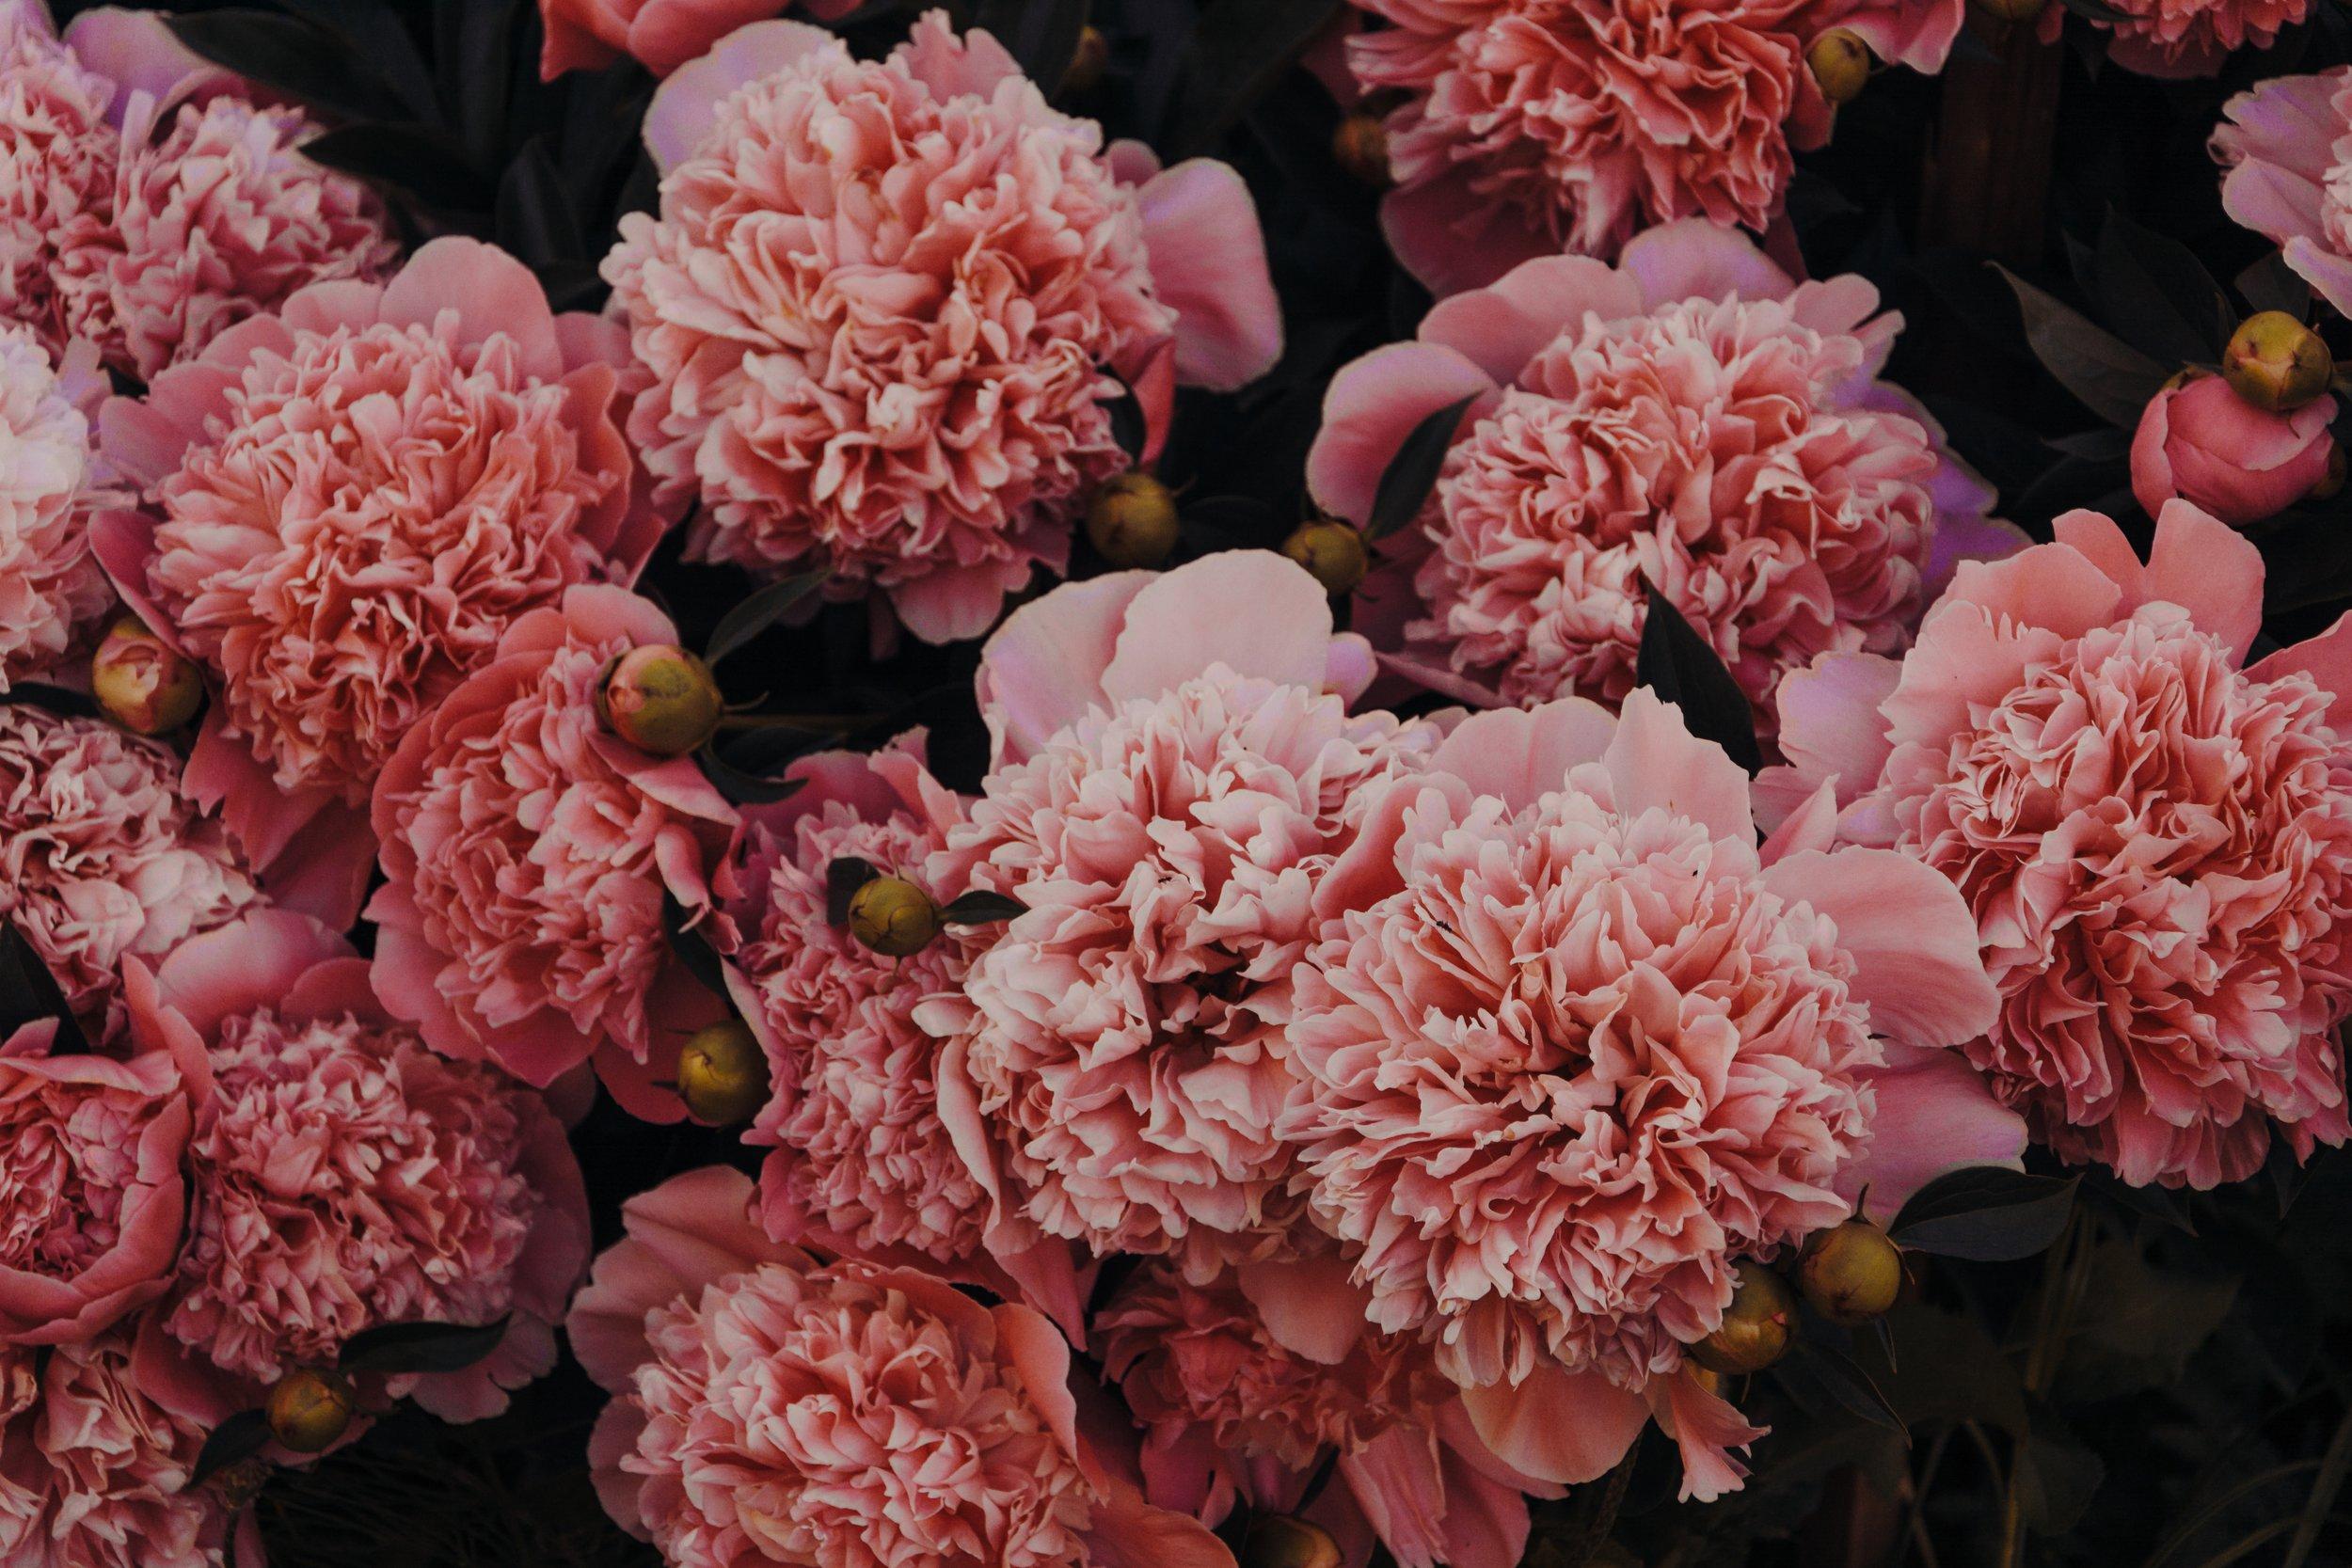 pink carnations.jpg